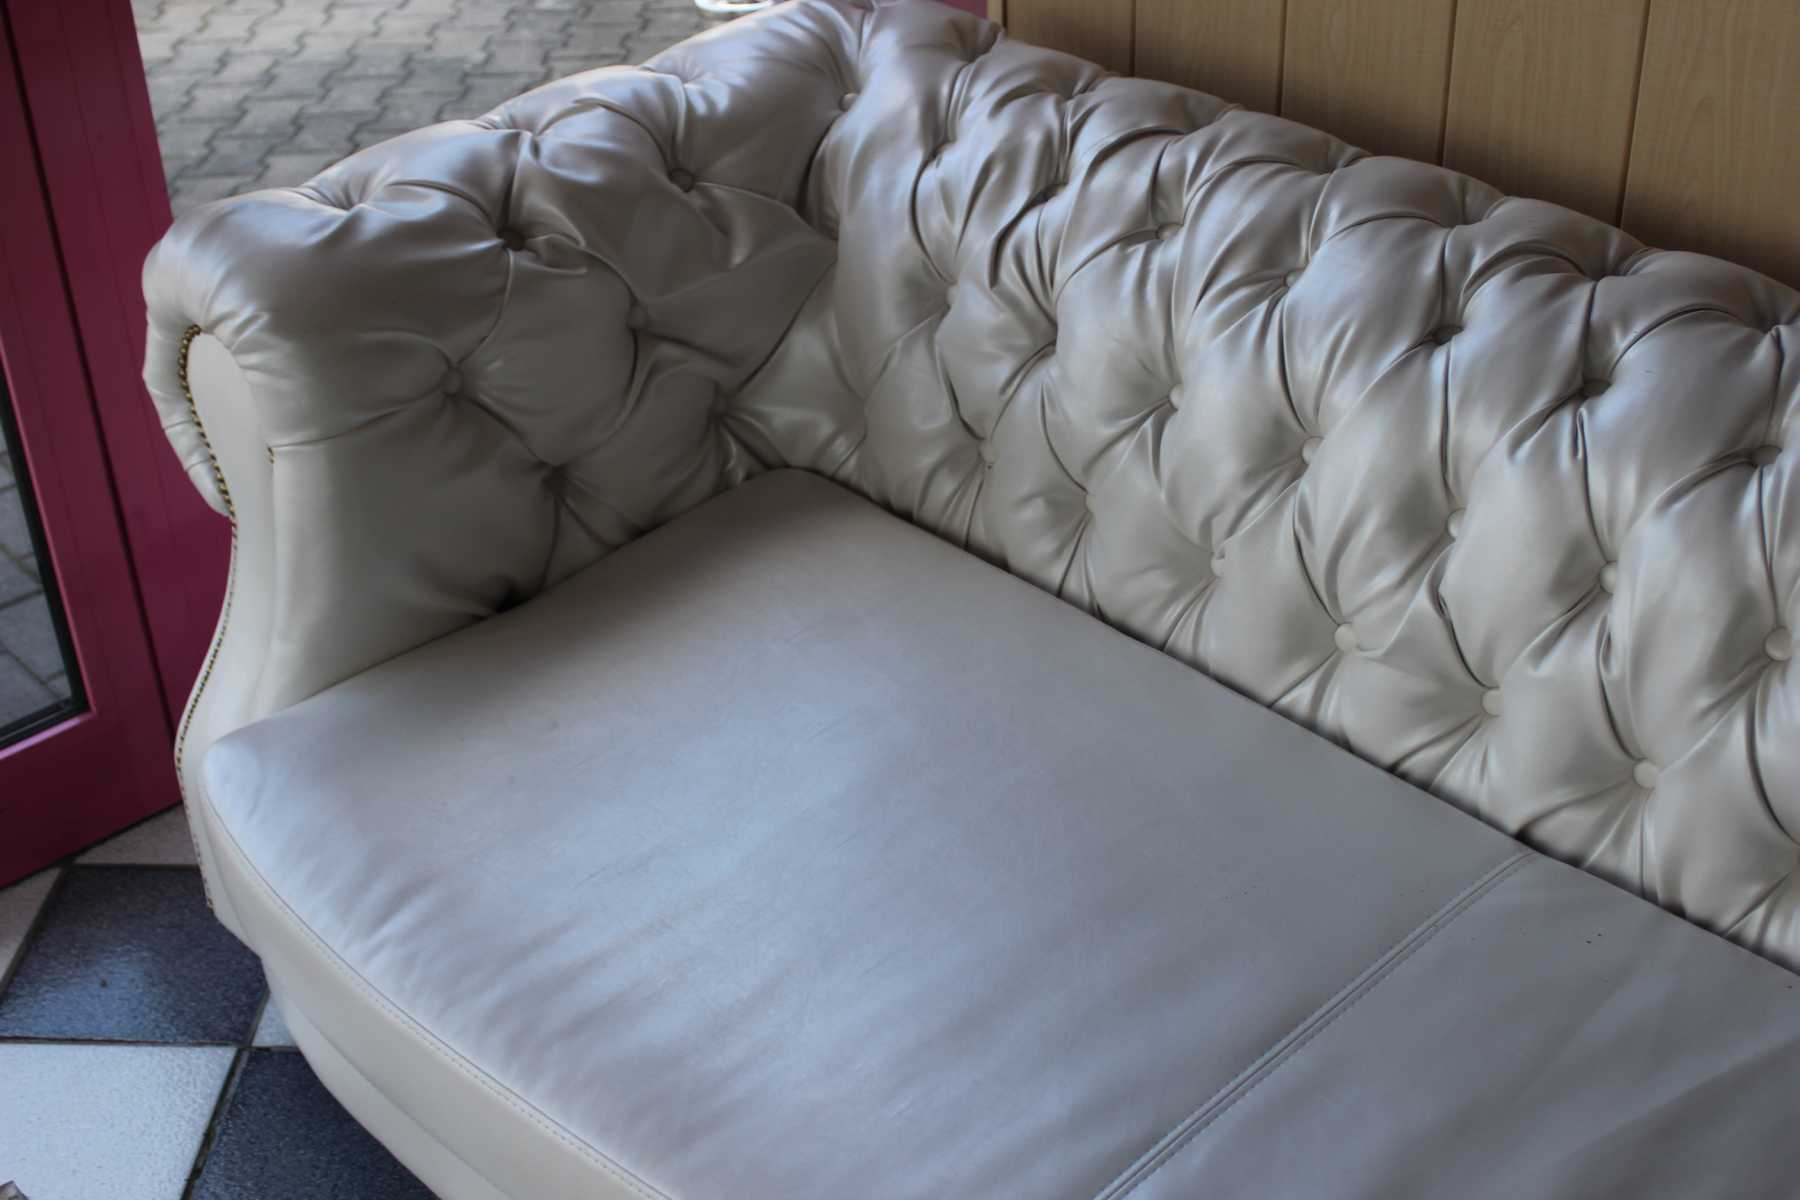 chesterfield sofas und ledersofas charly designersofa bei jv m bel. Black Bedroom Furniture Sets. Home Design Ideas